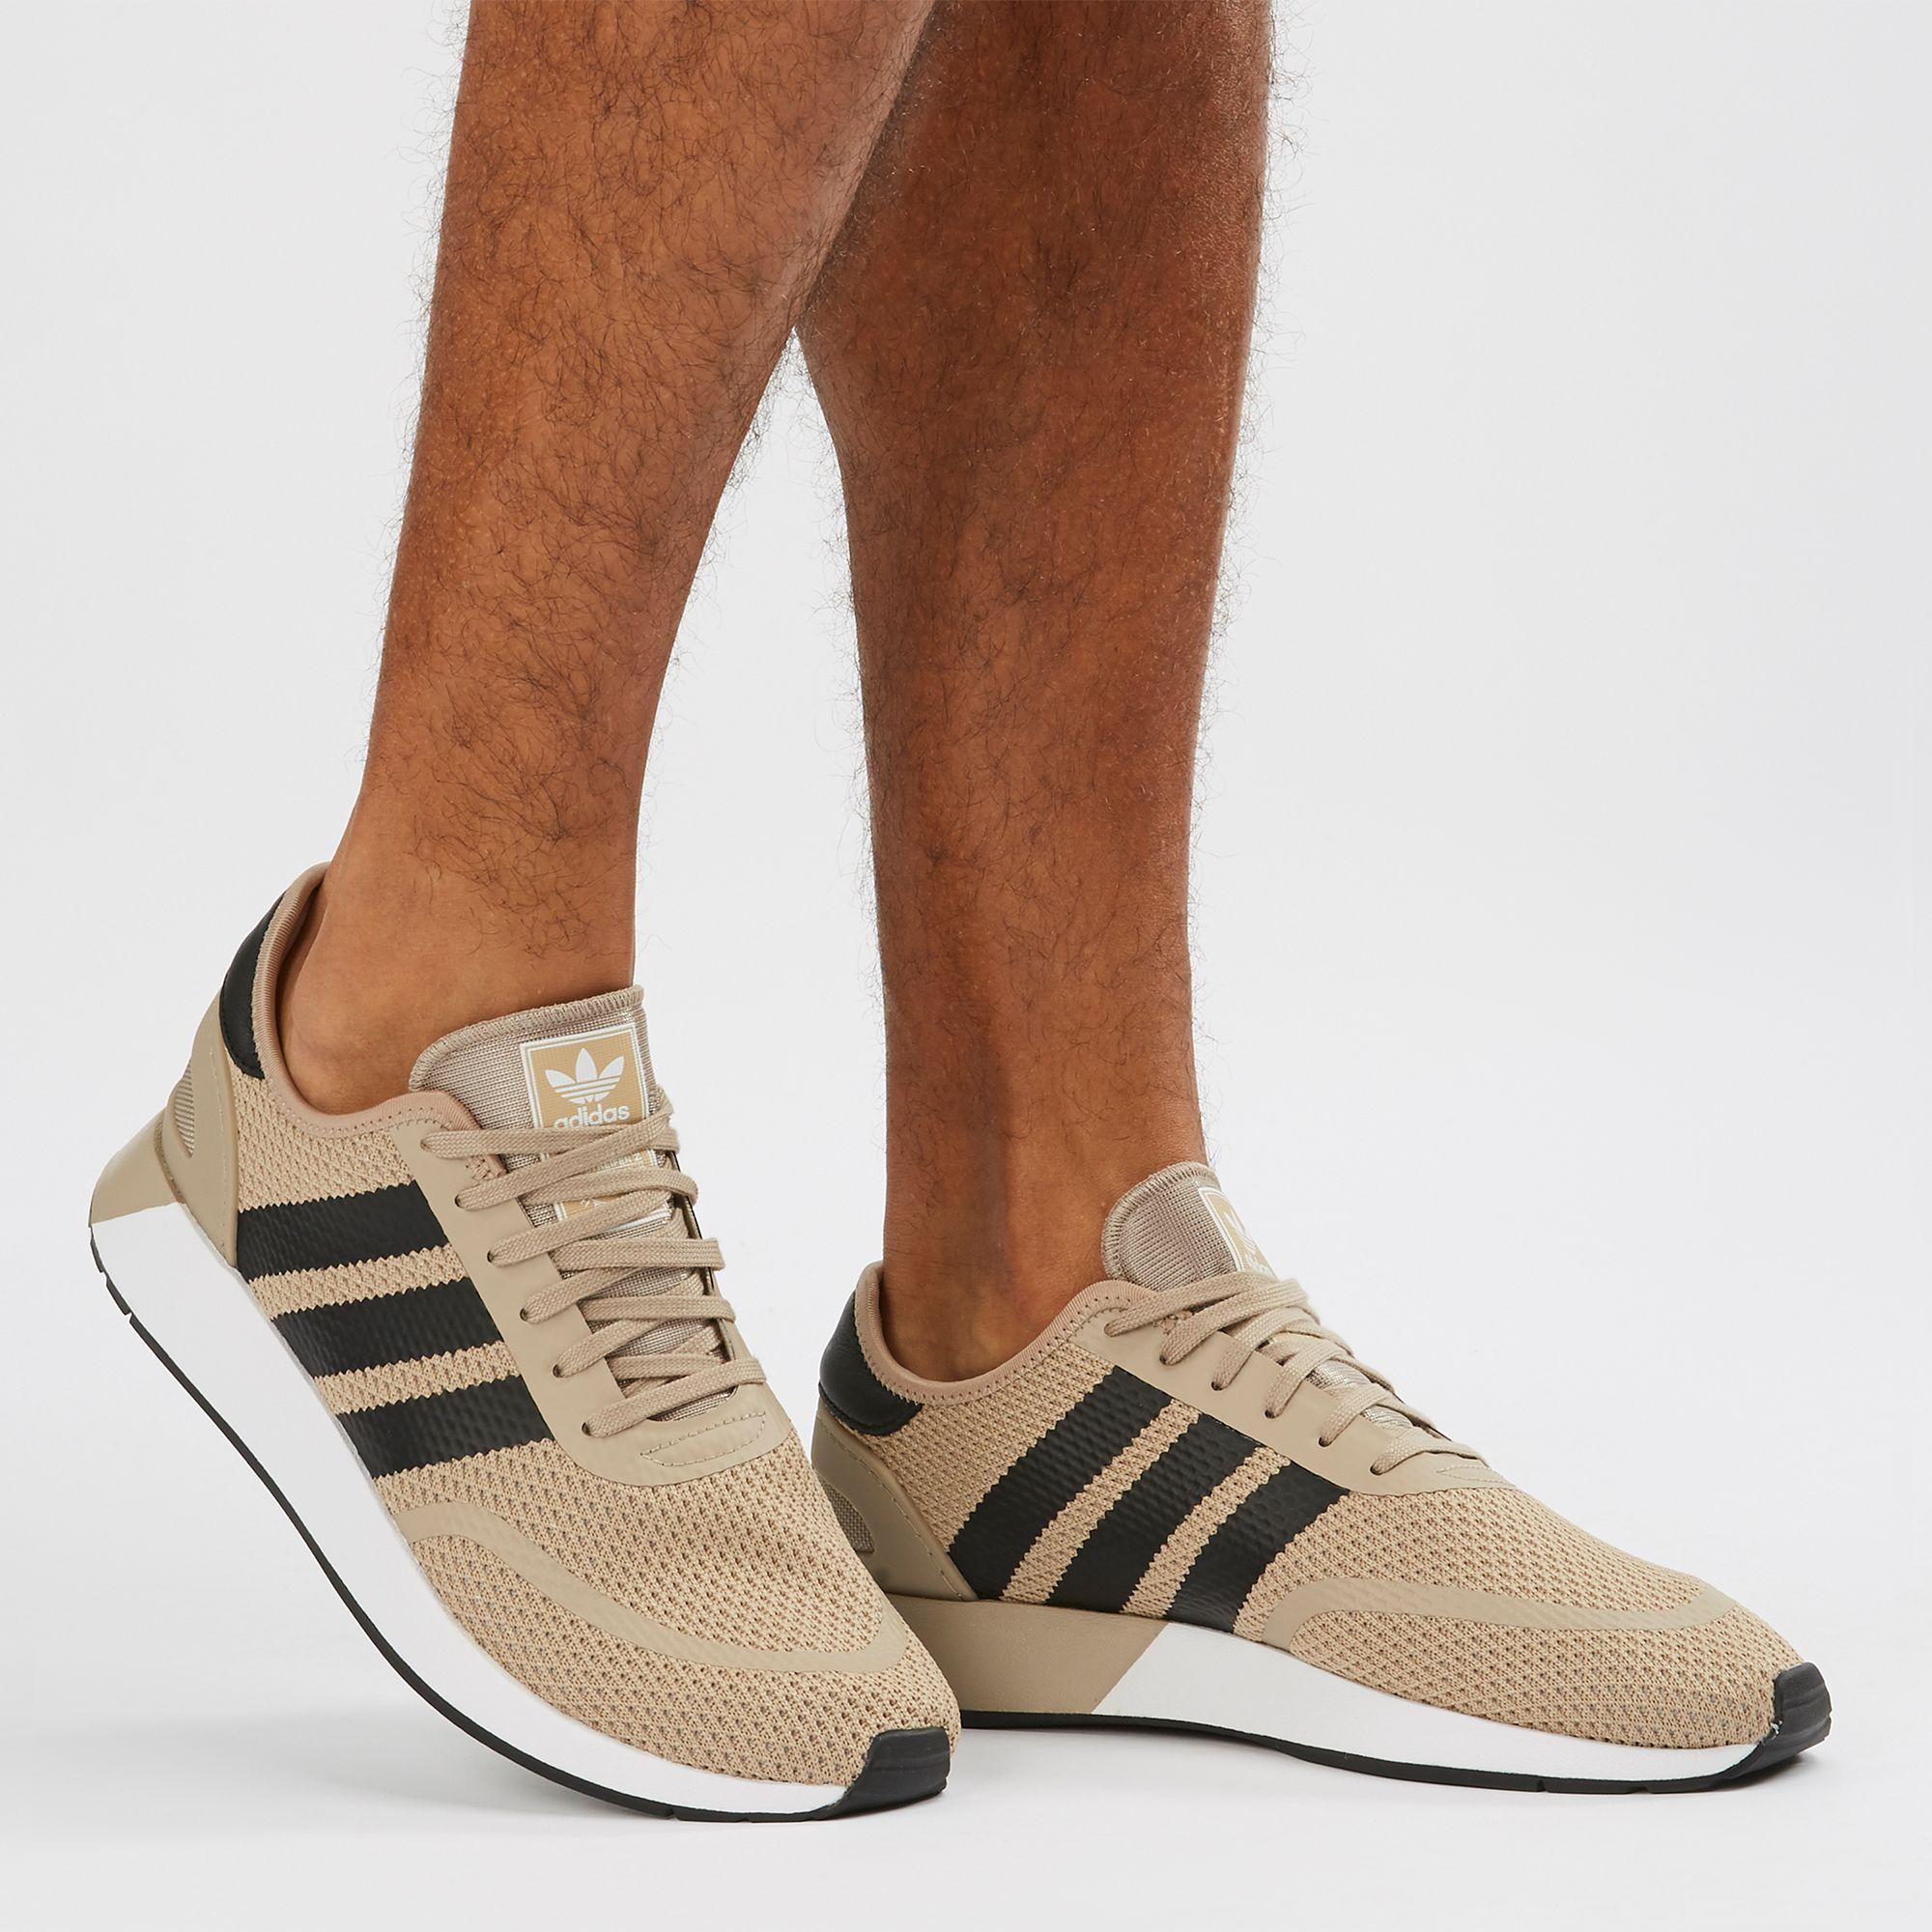 9c9c020dfa3 adidas Originals N-5923 Shoe | Sneakers | Shoes | SSS